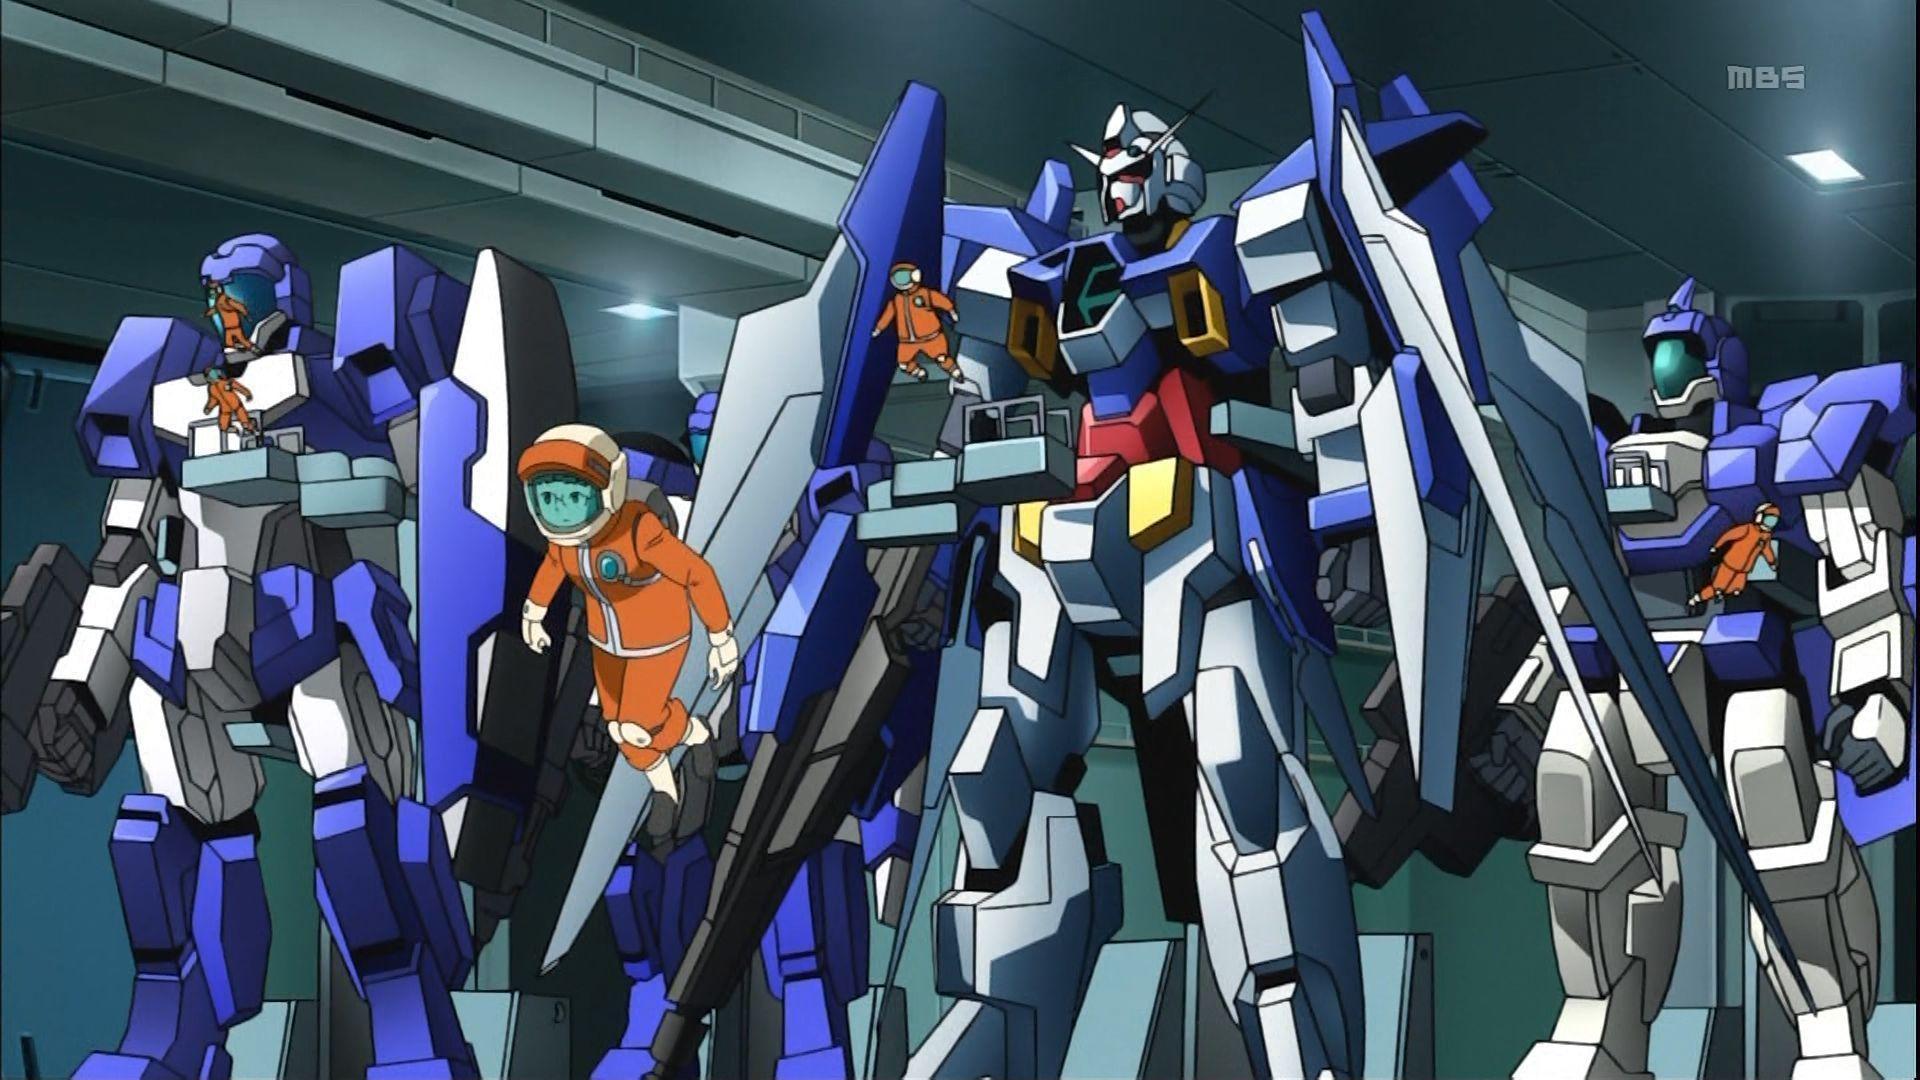 Mobile Fighter G Gundam Wallpapers 1920x1080